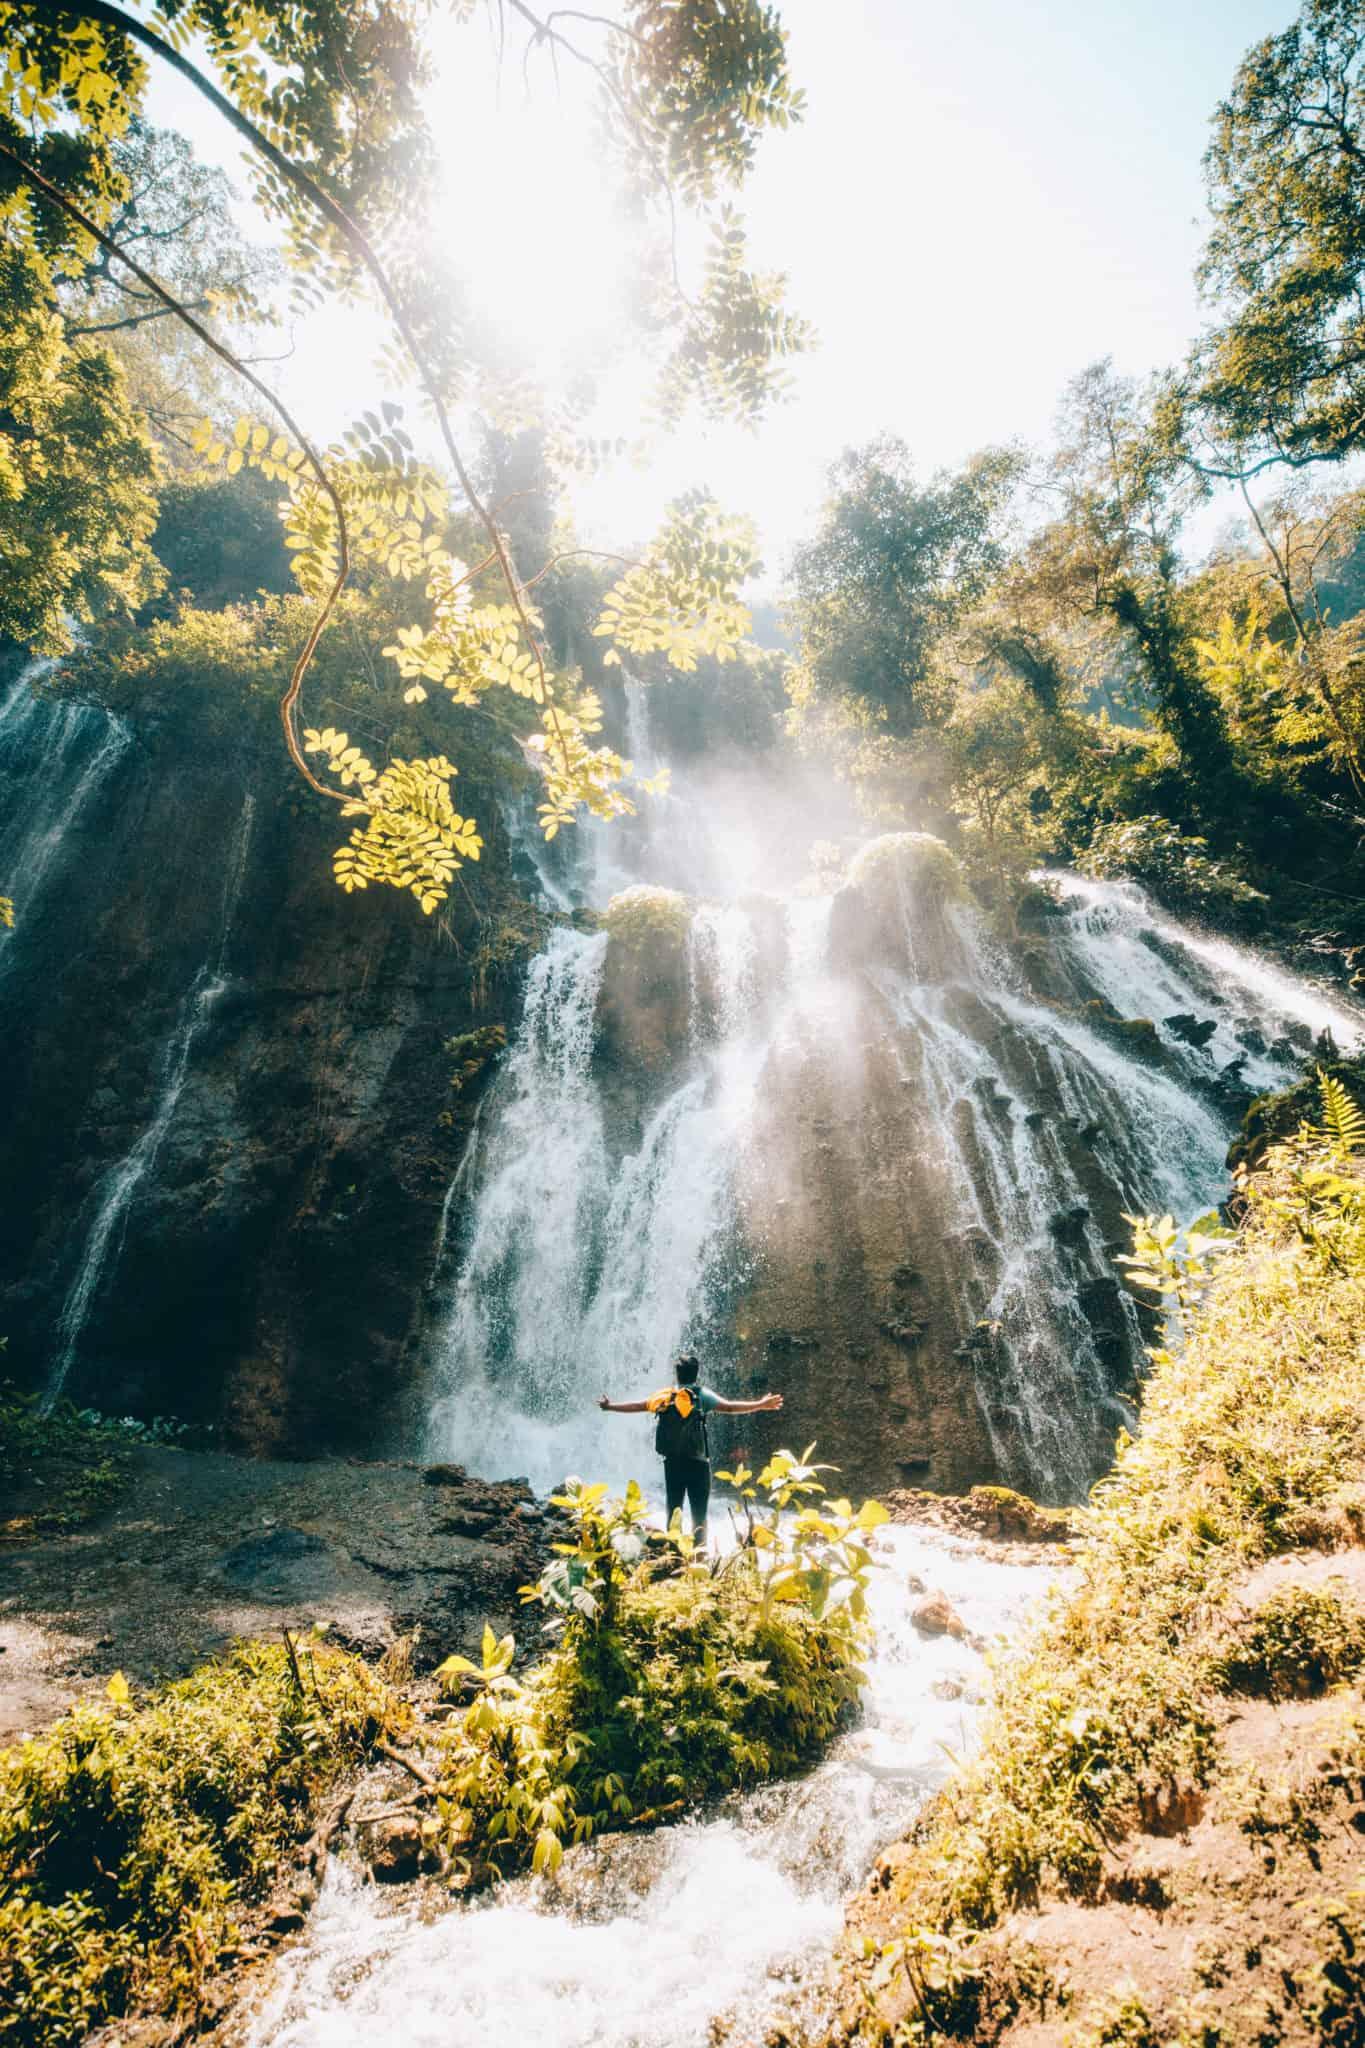 Goa Tetes - East Java Waterfalls - TheMandagies.com